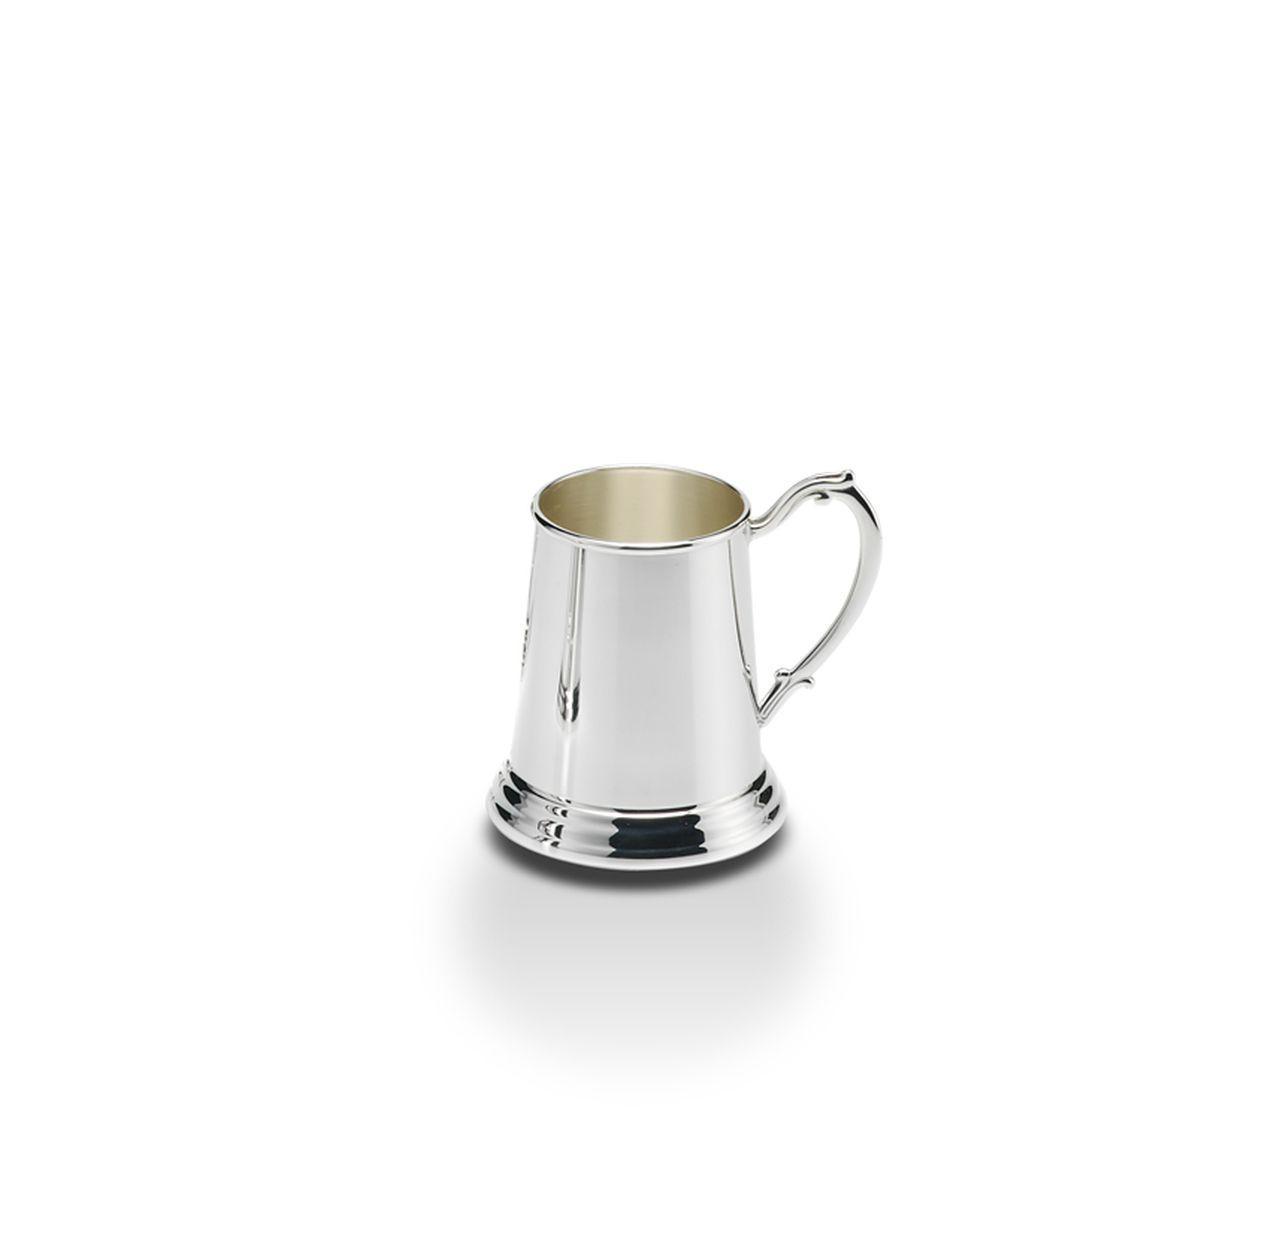 Boccale stile inglese argentato argento sheffield cm.11h diam.7,5